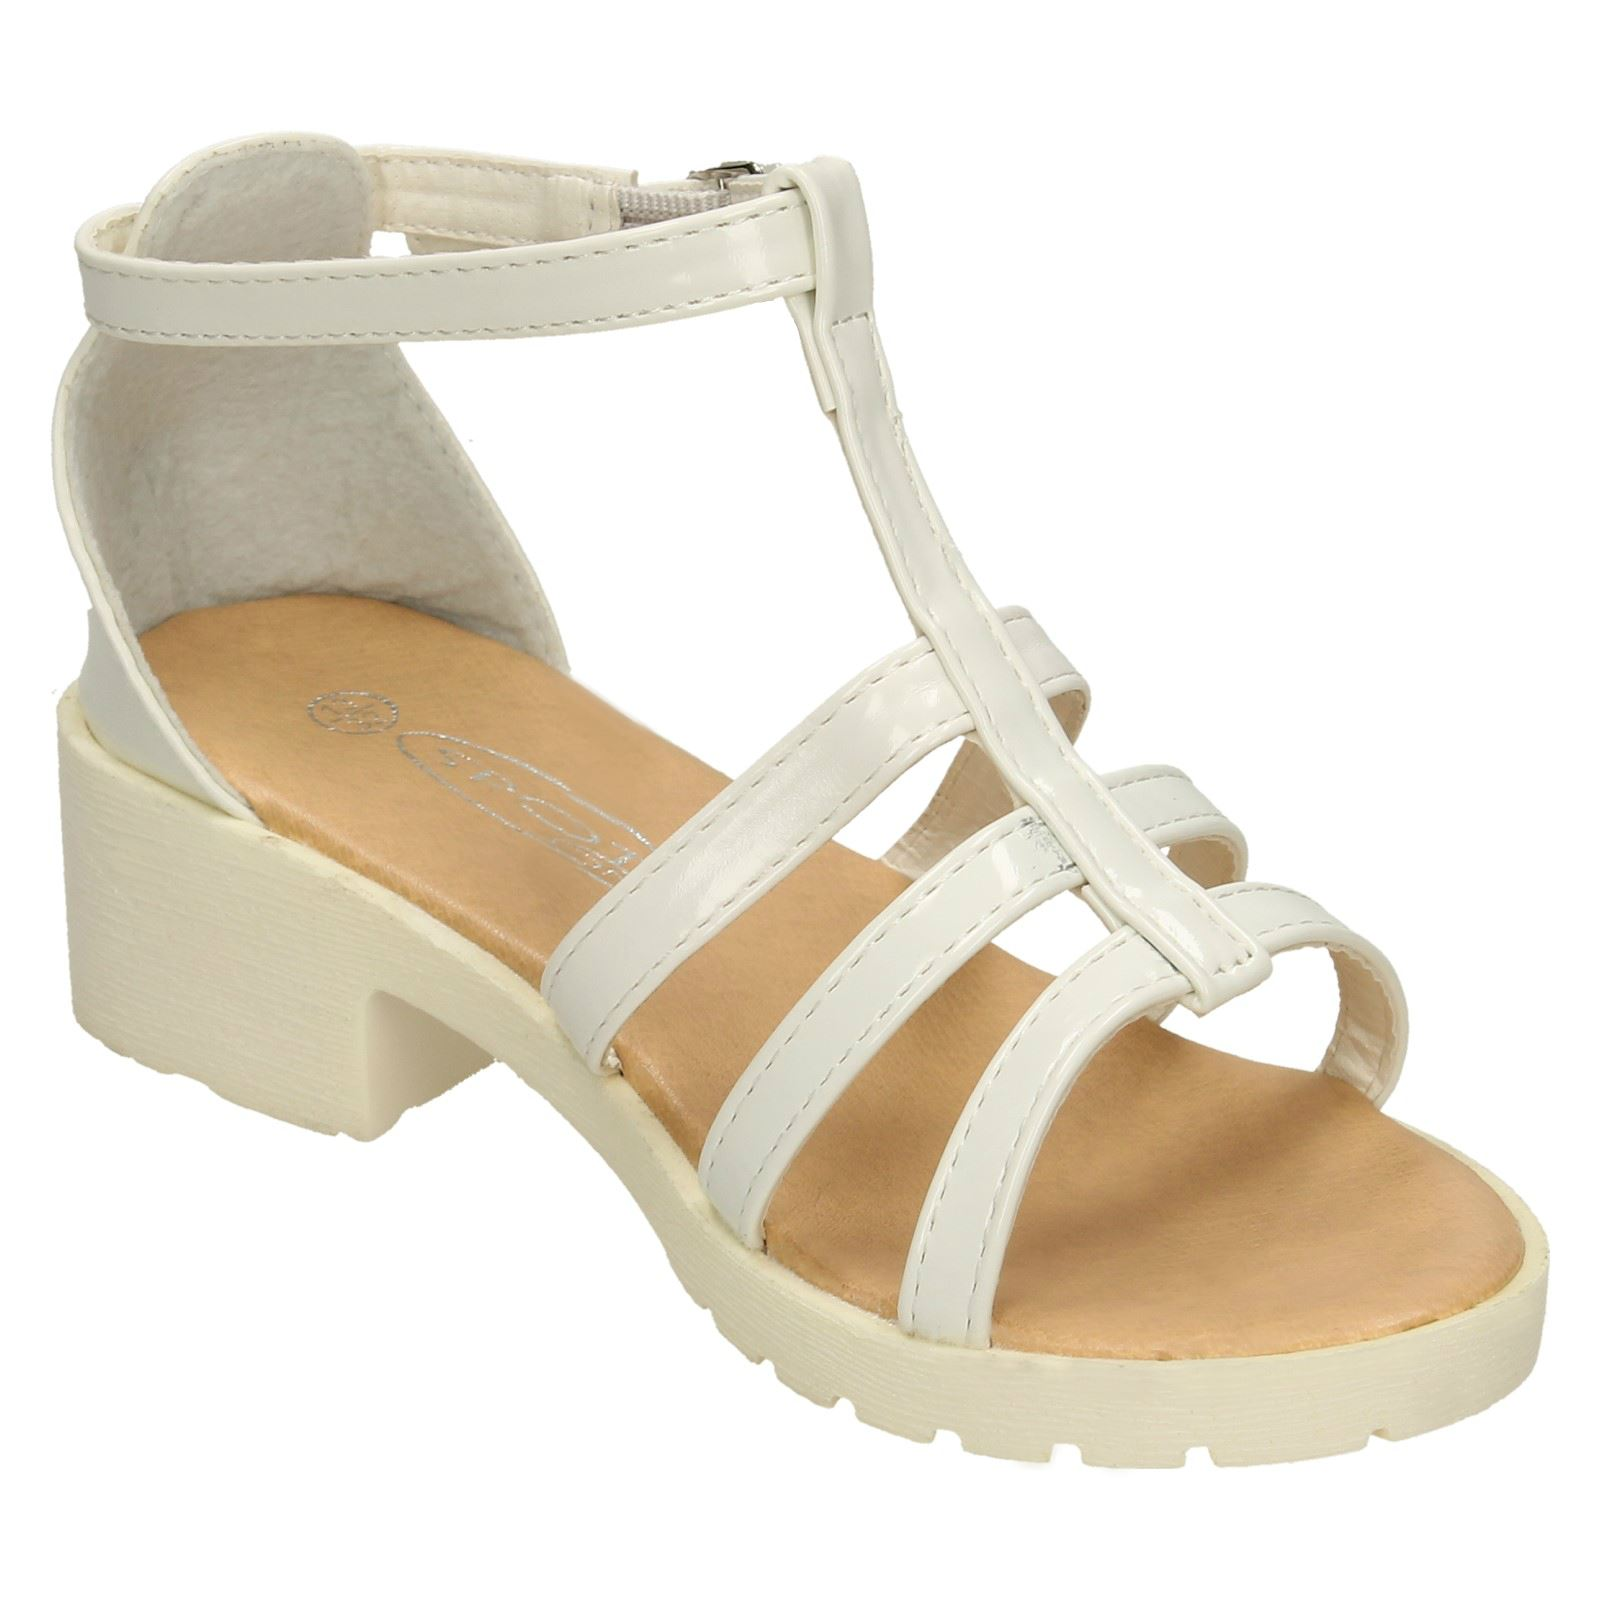 Girls Low Heeled Sandals Spot On